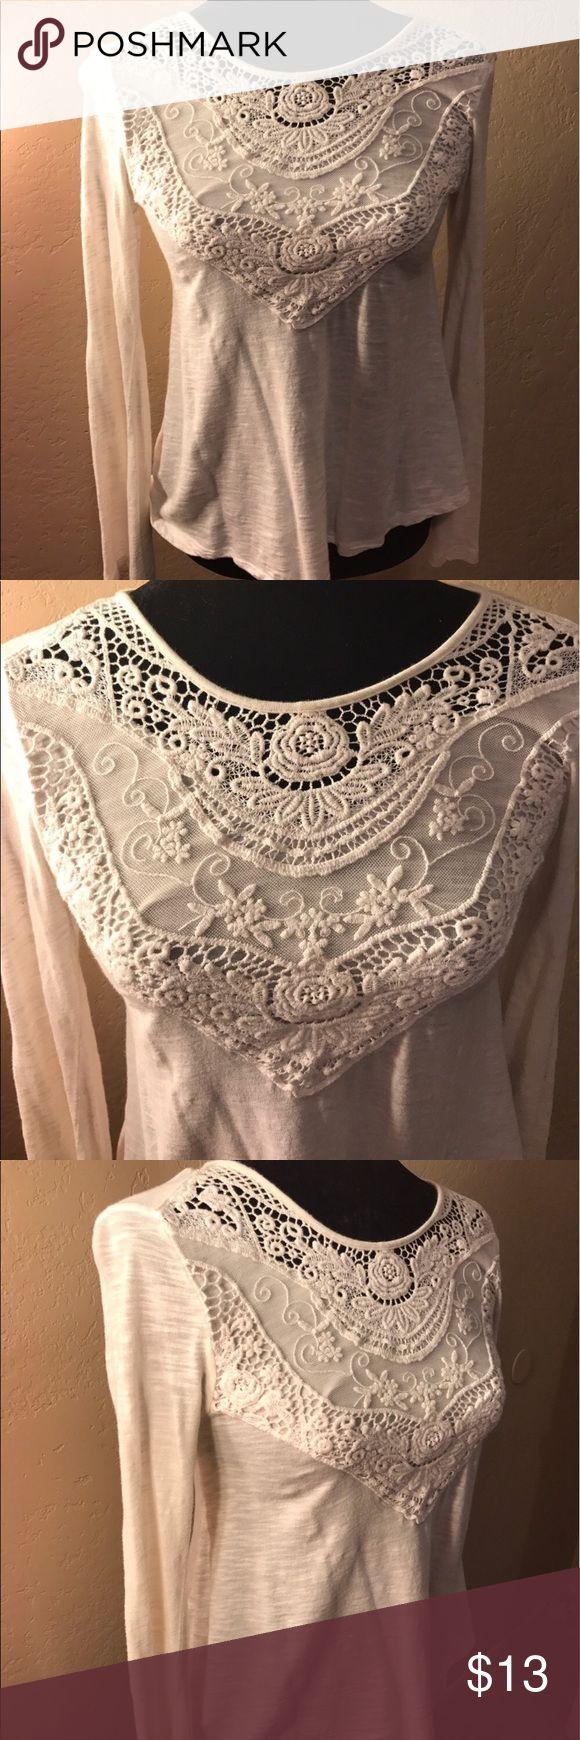 • xhilaration crochet womens long sleeve blouse • Beautiful NWOT cream colored crochet long sleeve from Target. No flaws Xhilaration Tops Tees - Long Sleeve